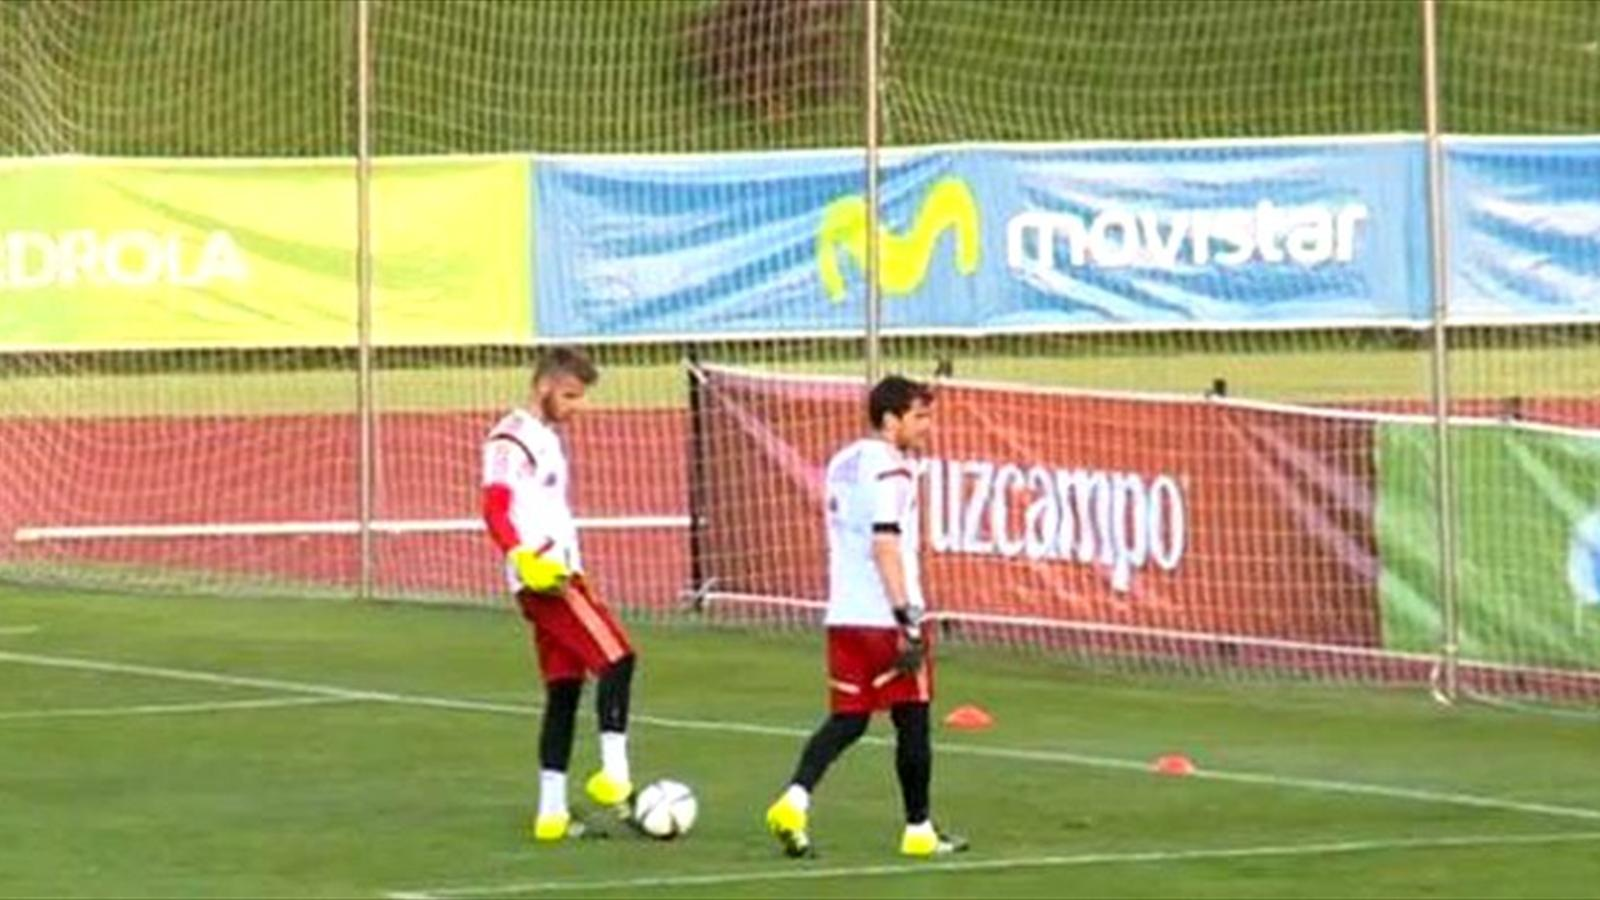 Spain goalkeeper David De Gea nutmegs team-mate Iker Casillas (Twitter)